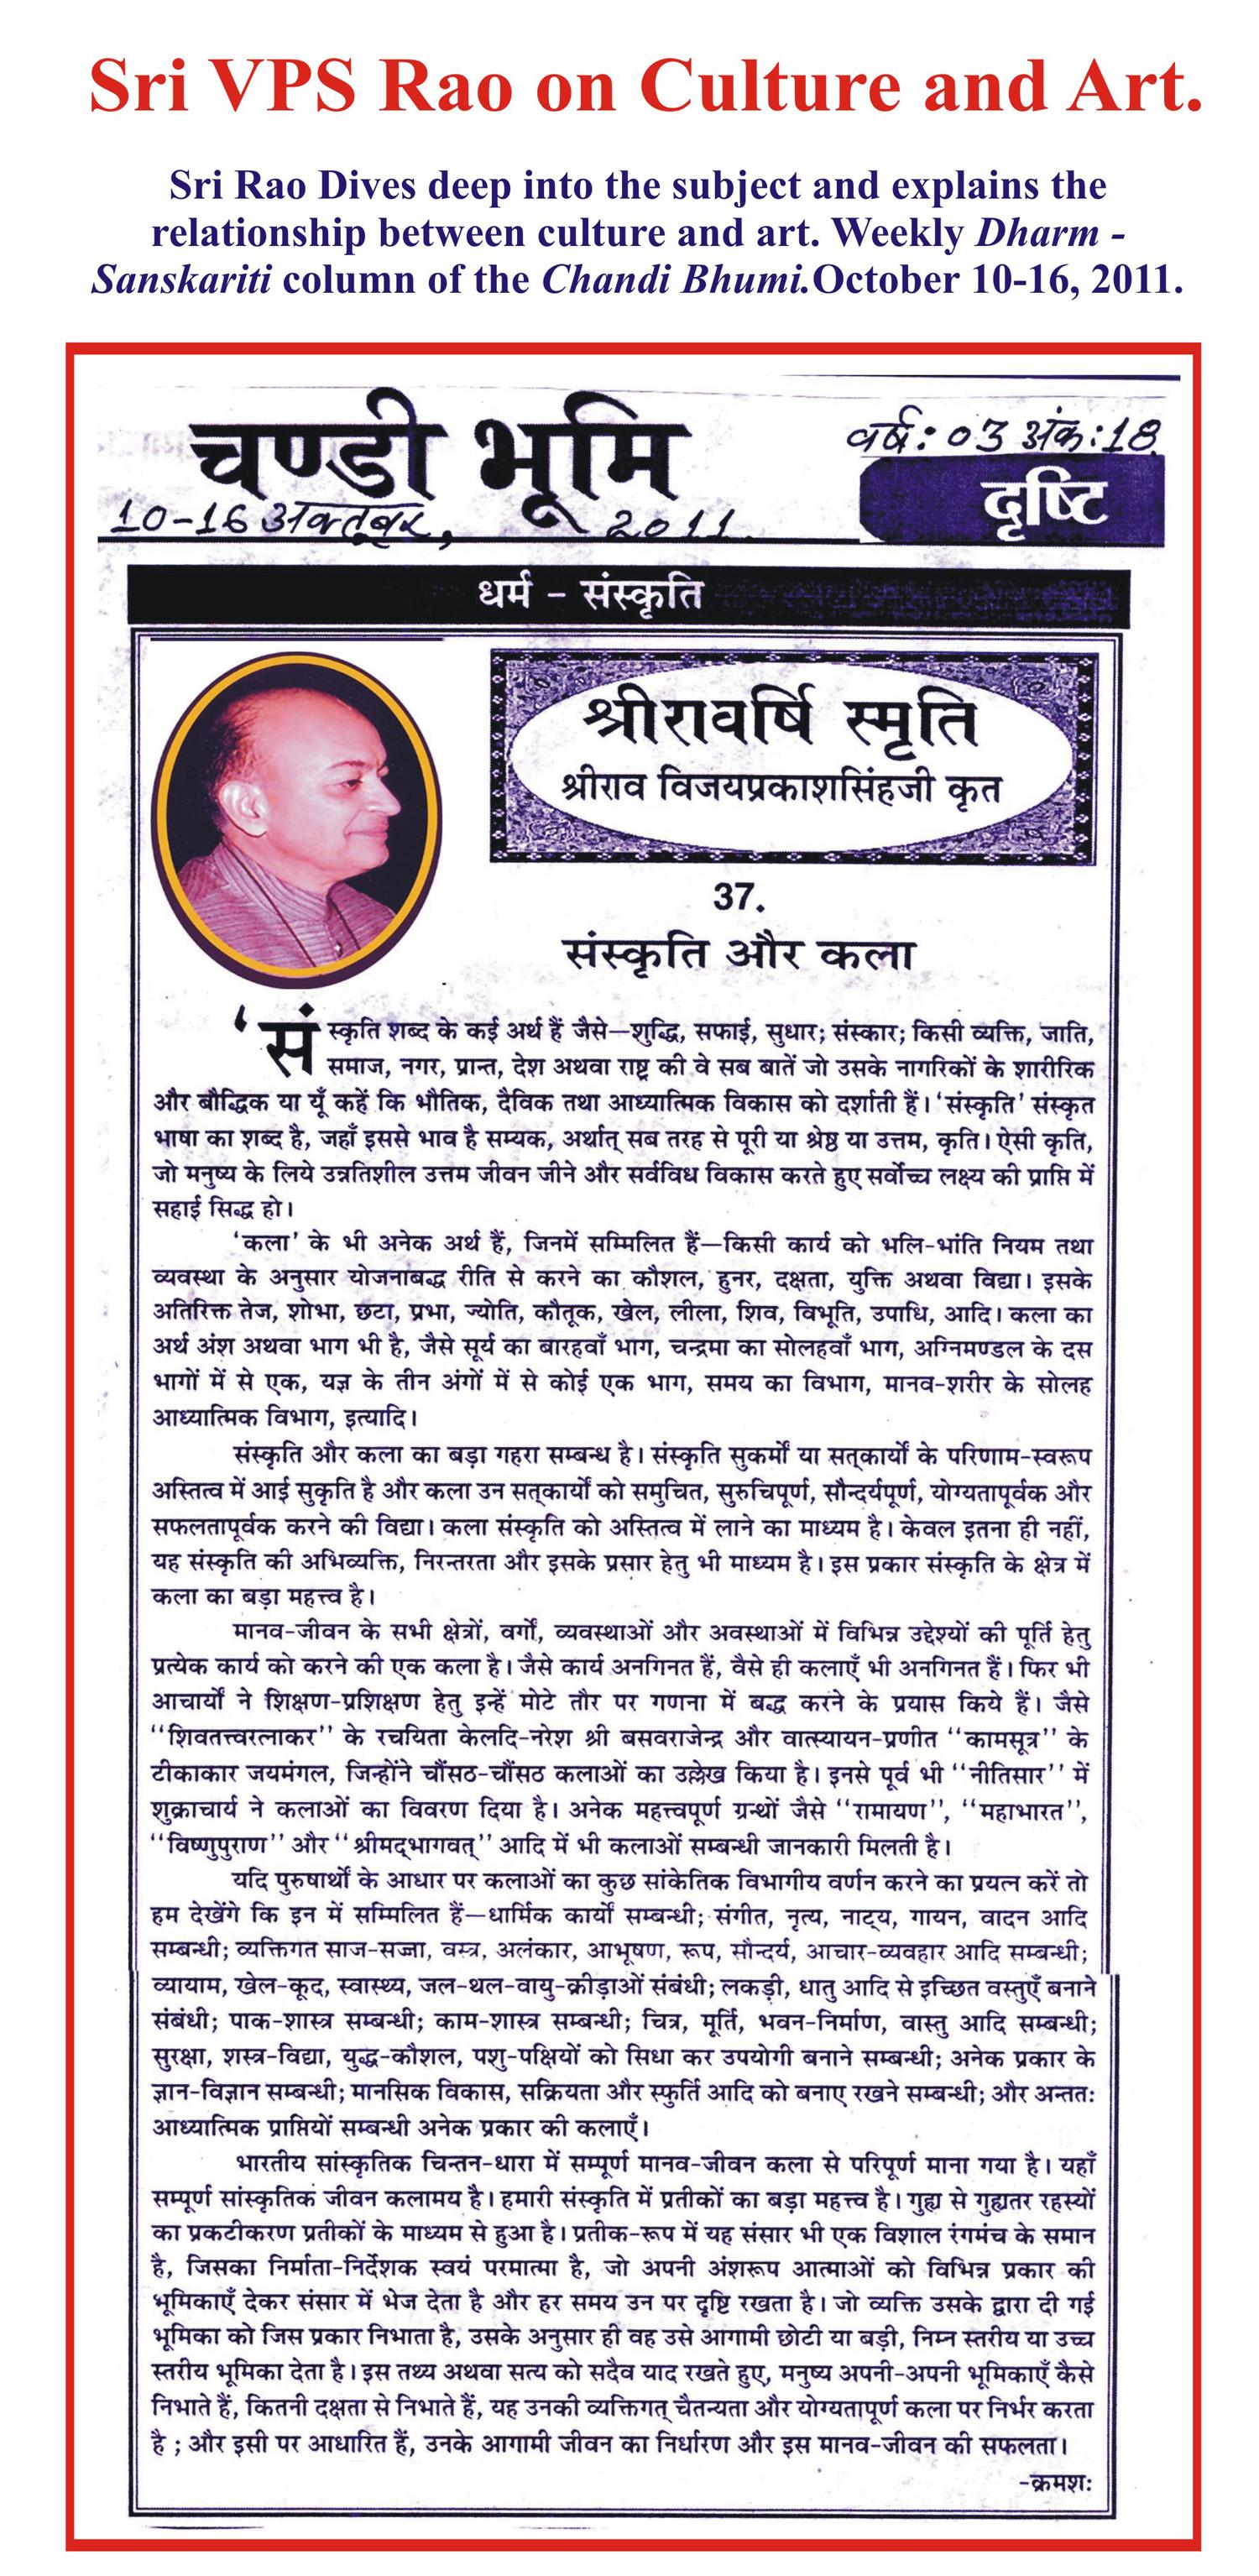 Sri VPS Rao on Culture and Arta